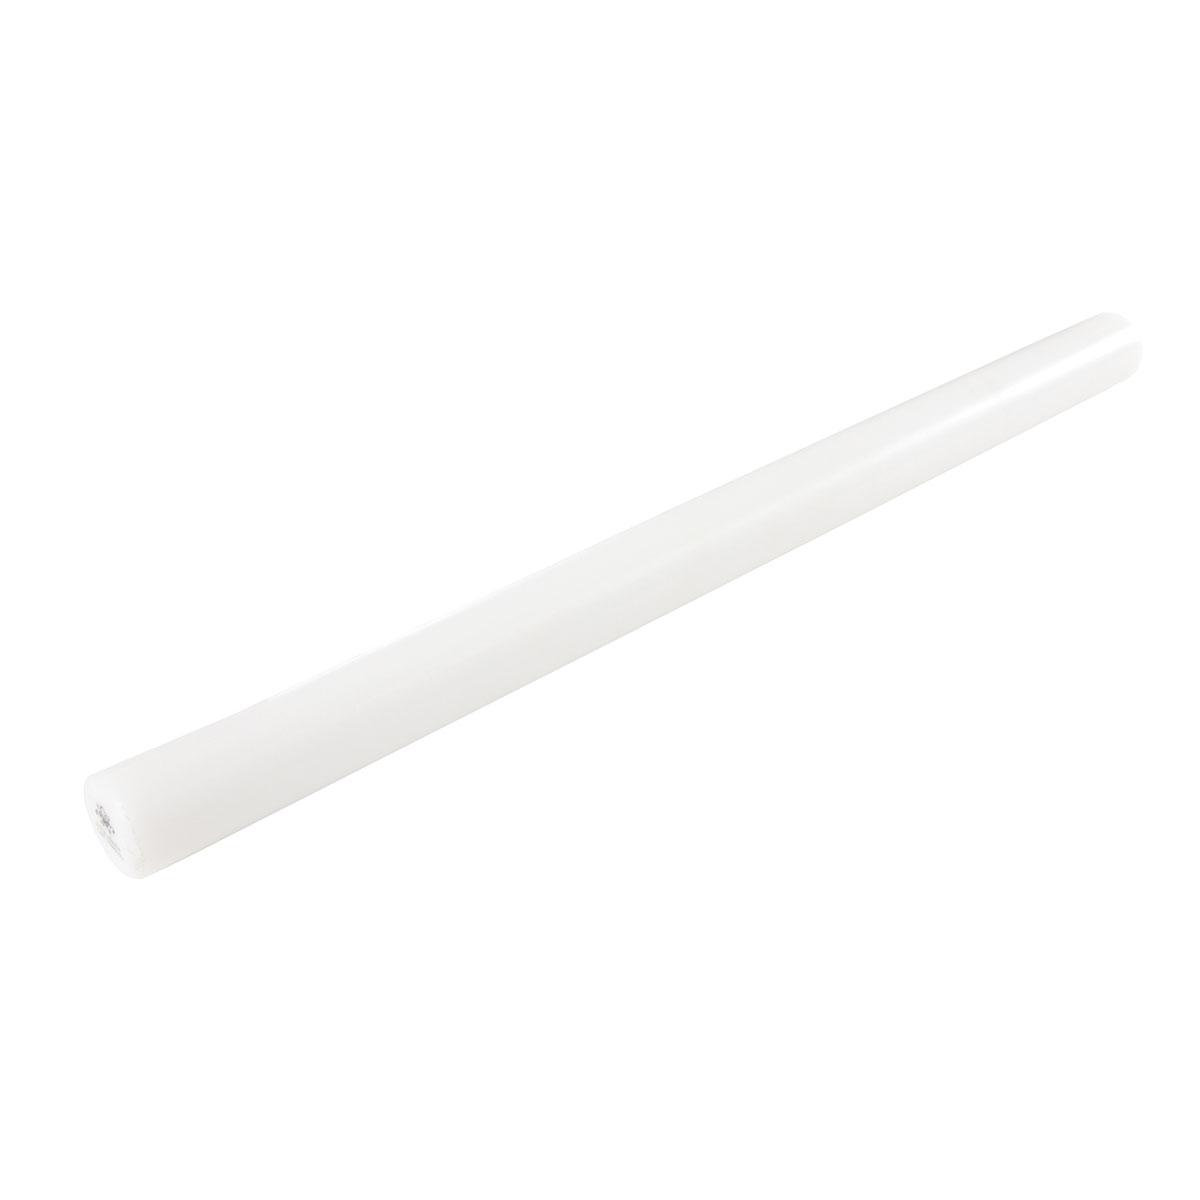 Rodillo Polietileno antiadherente 50cm